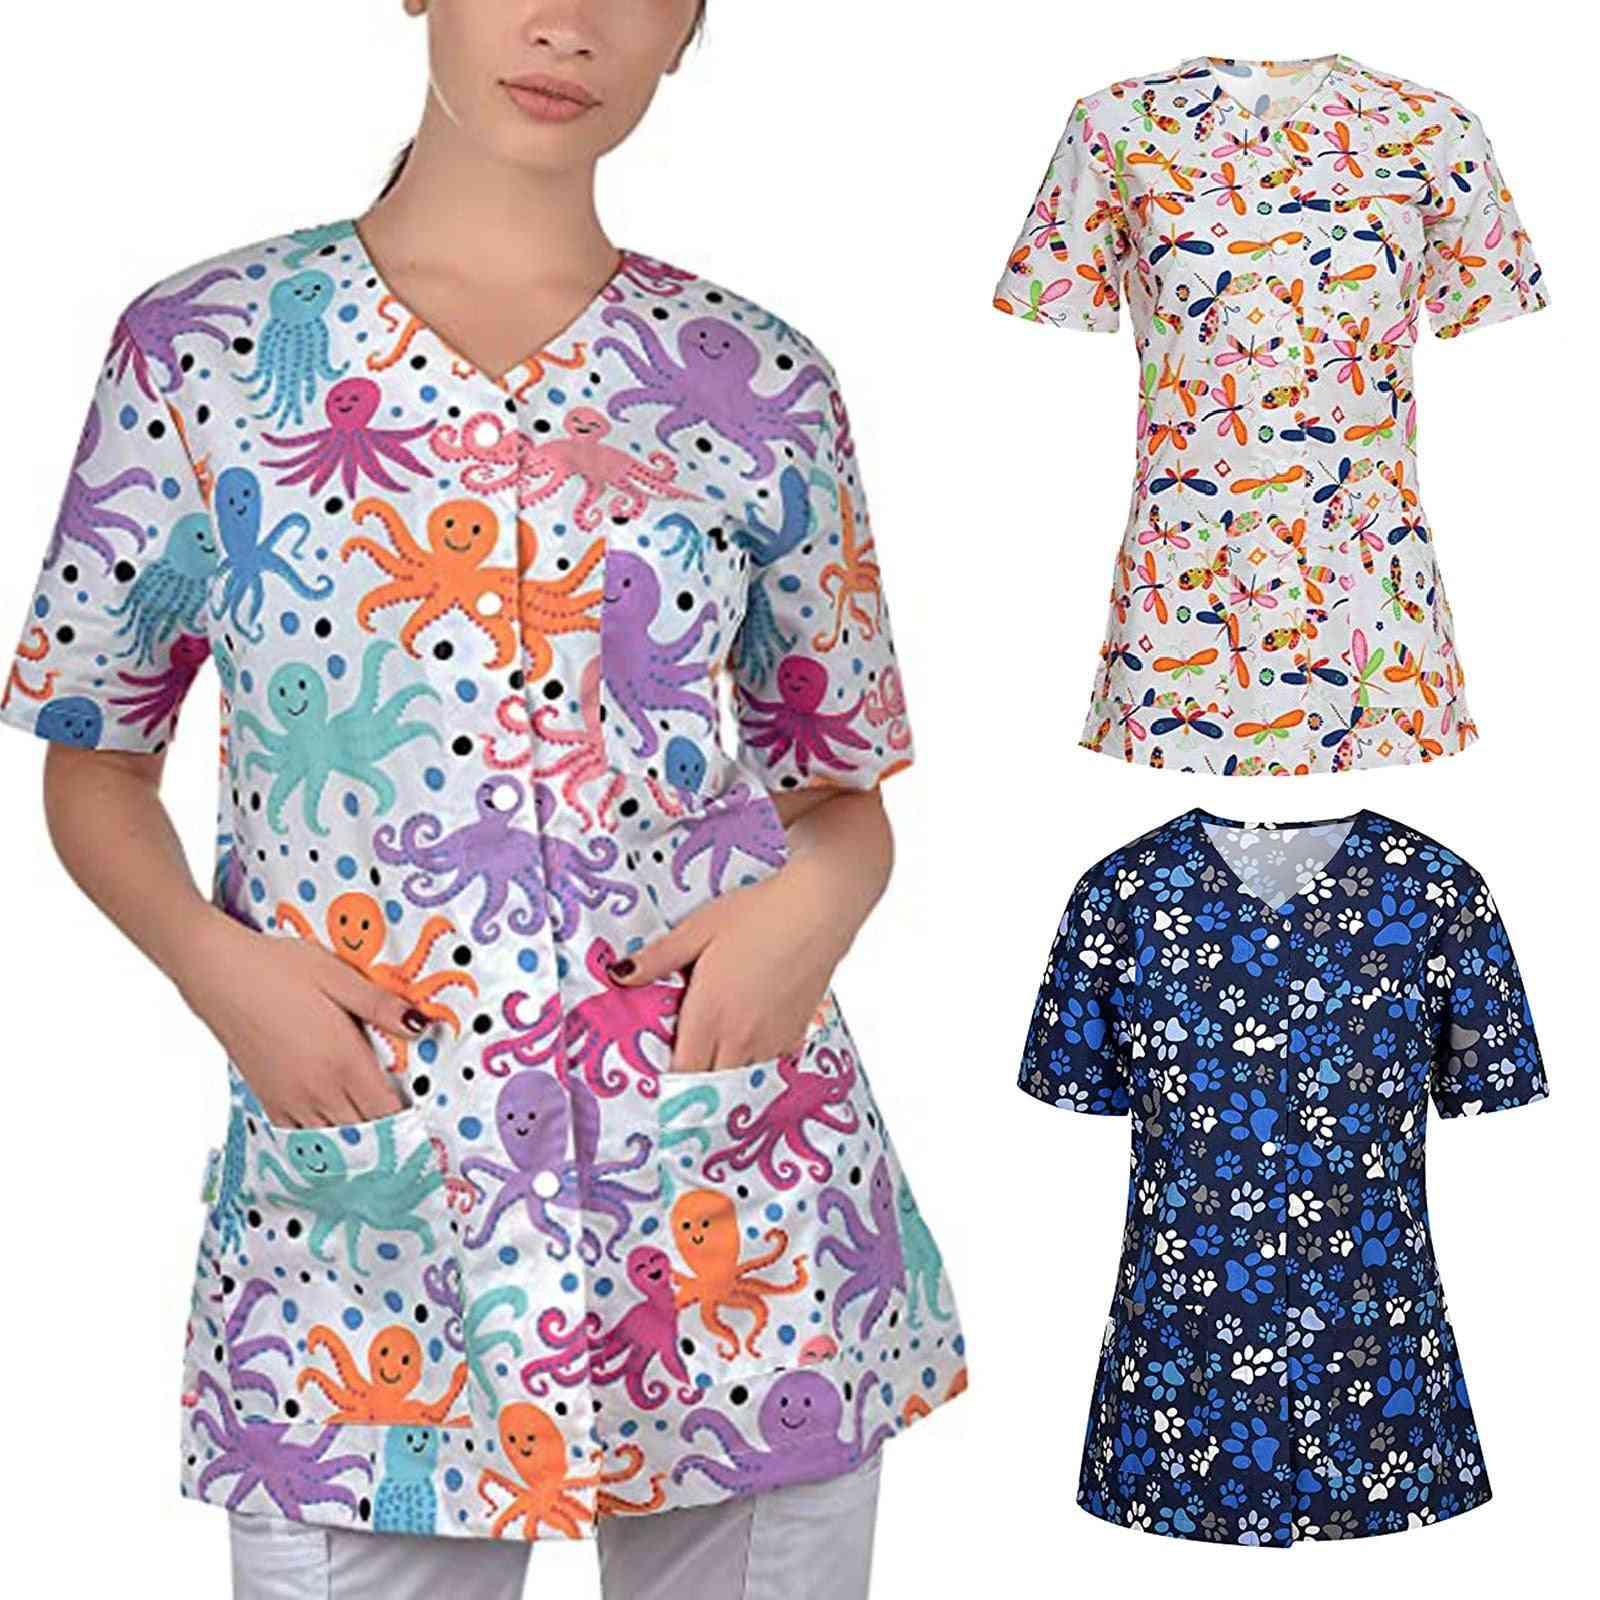 Women Uniform Short Sleeve V-neck Cardigan Jacket Buttons Tops